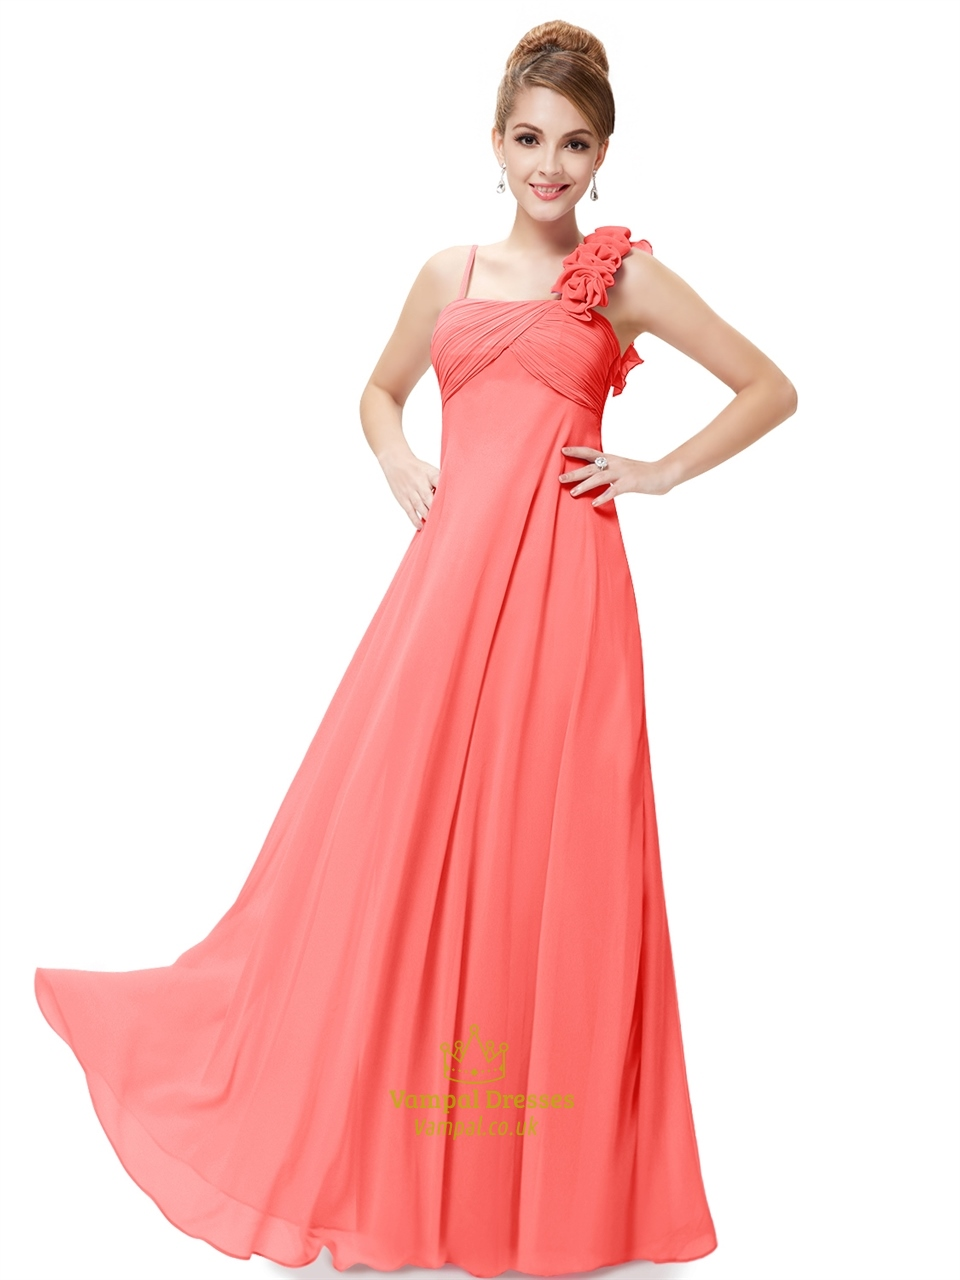 Orange Spaghetti Strap Chiffon Bridesmaid Dresses With